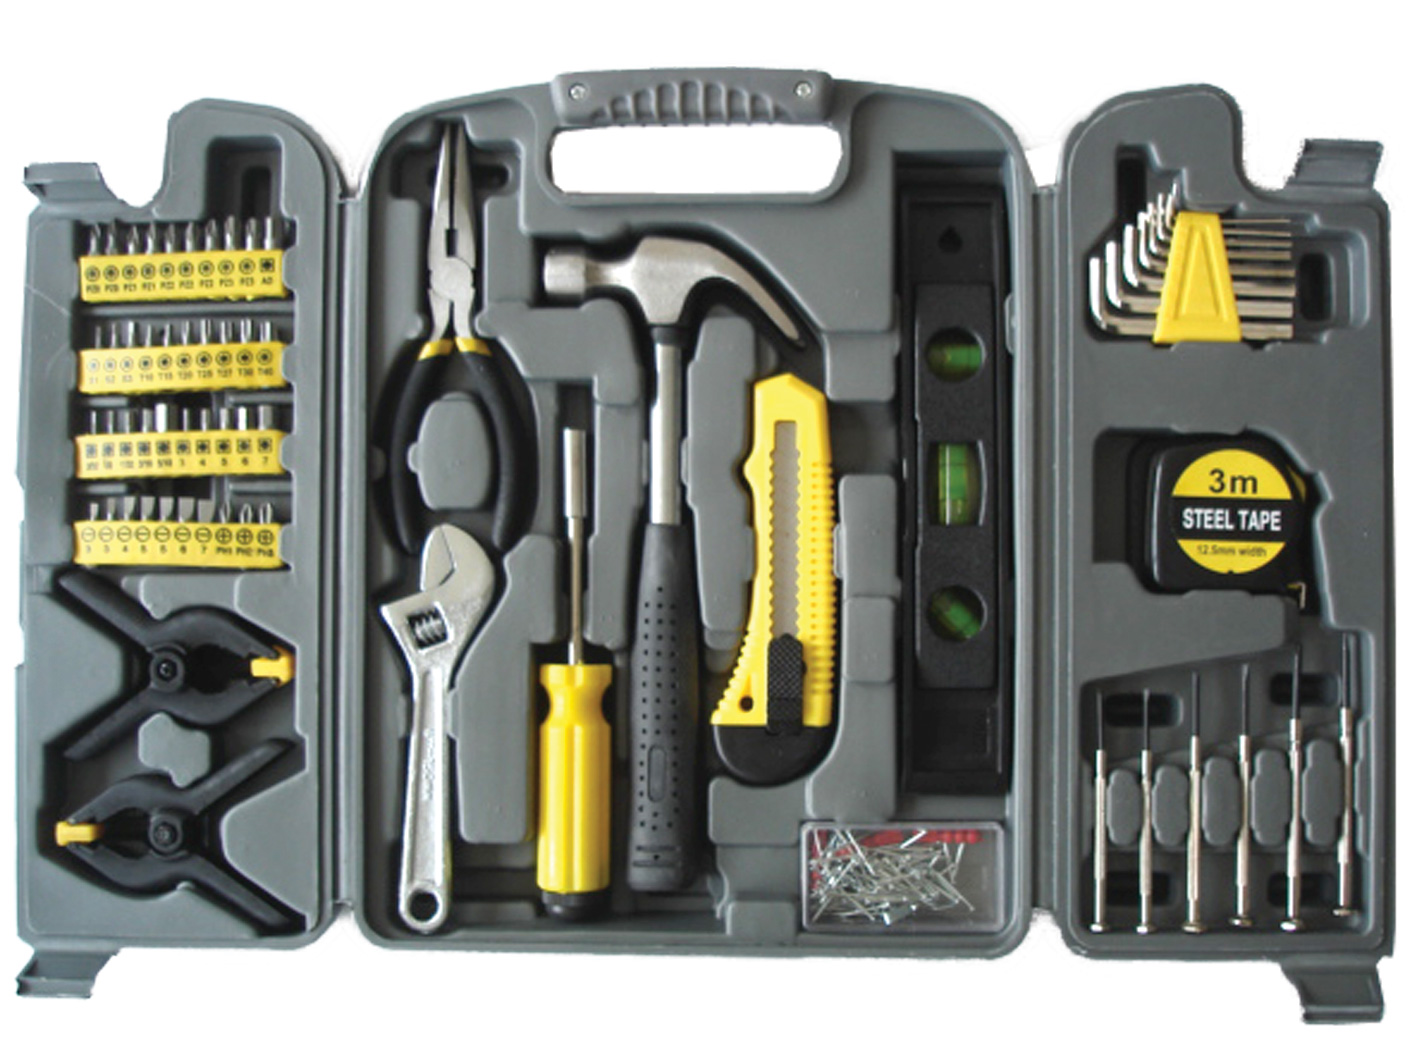 Универсальный набор инструментов Sturm! 1310-01-ts145 набор инструмента sturm 1310 01 ts1